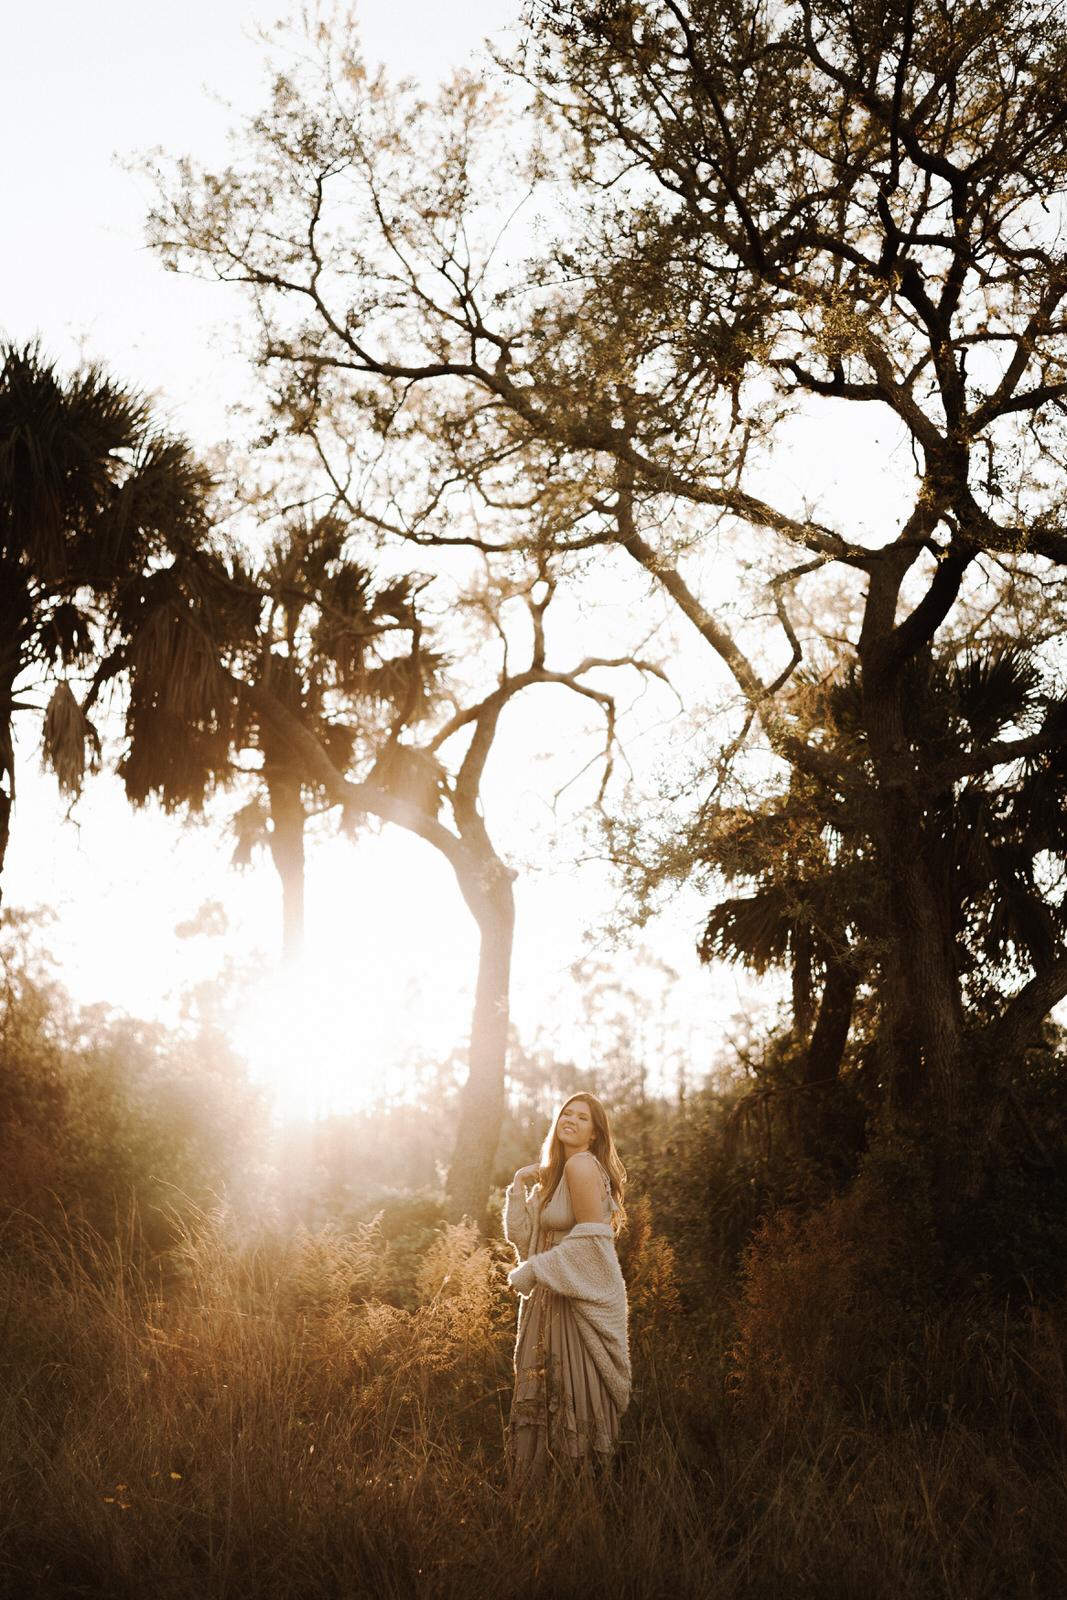 Fort Myers Senior Photos- Michelle Gonzalez Photography- Kristen Harder-151.JPG